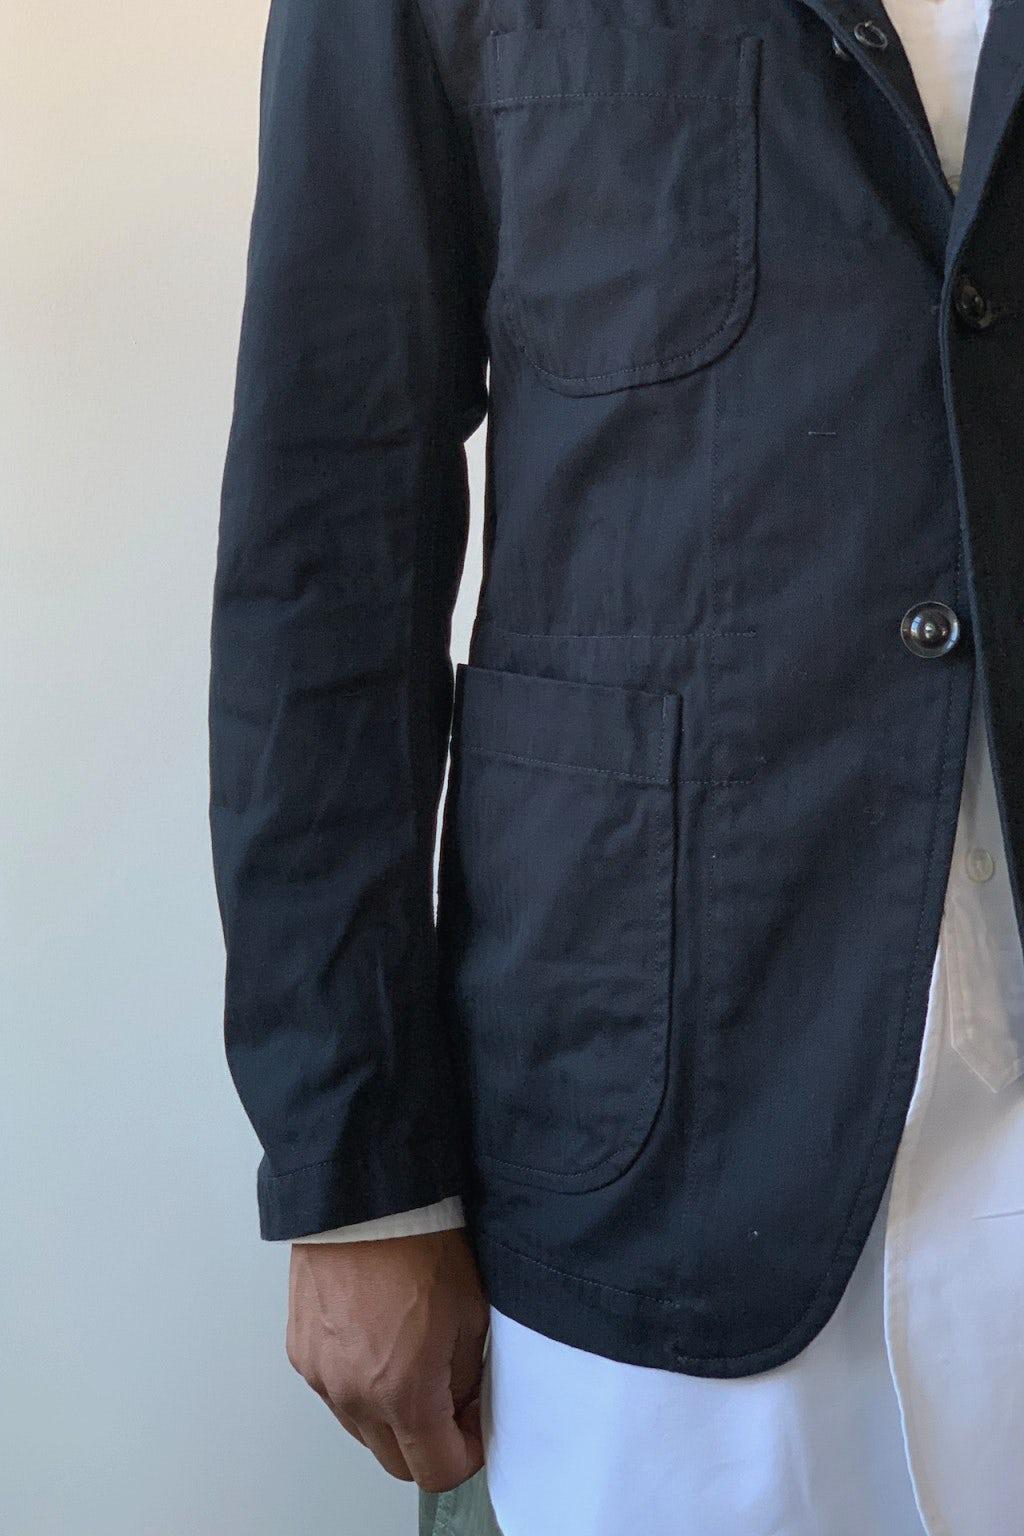 Engineered Garments Bedford Jacket  Black Cotton Herringbone Twill